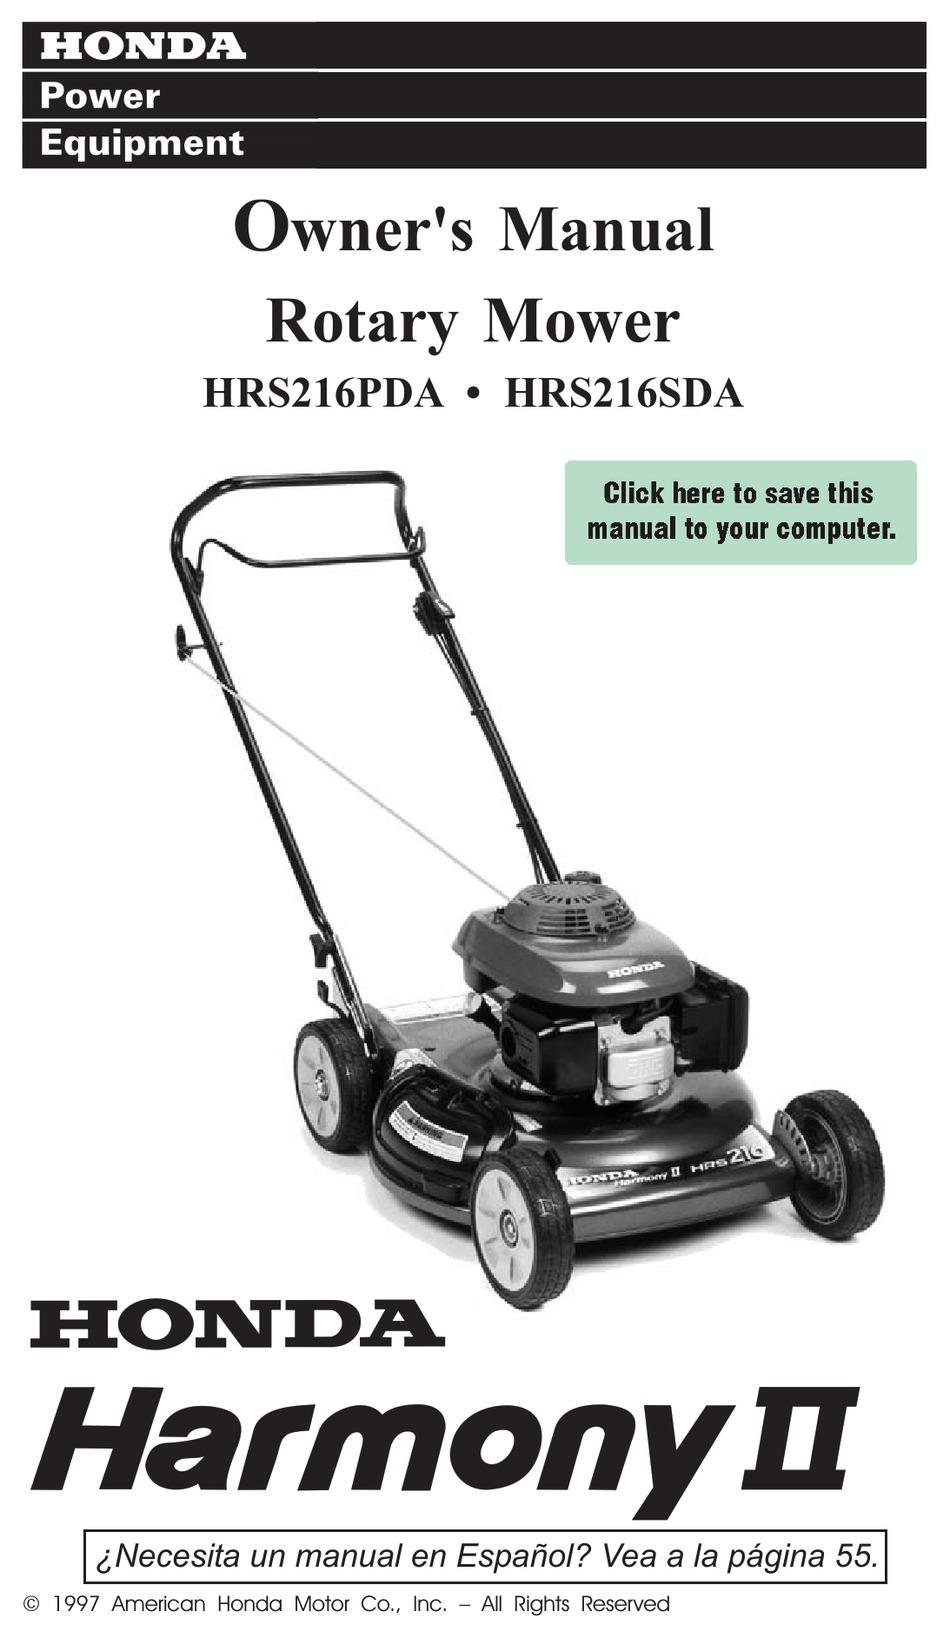 HONDA HARMONY II HRS216PDA OWNER'S MANUAL Pdf Download